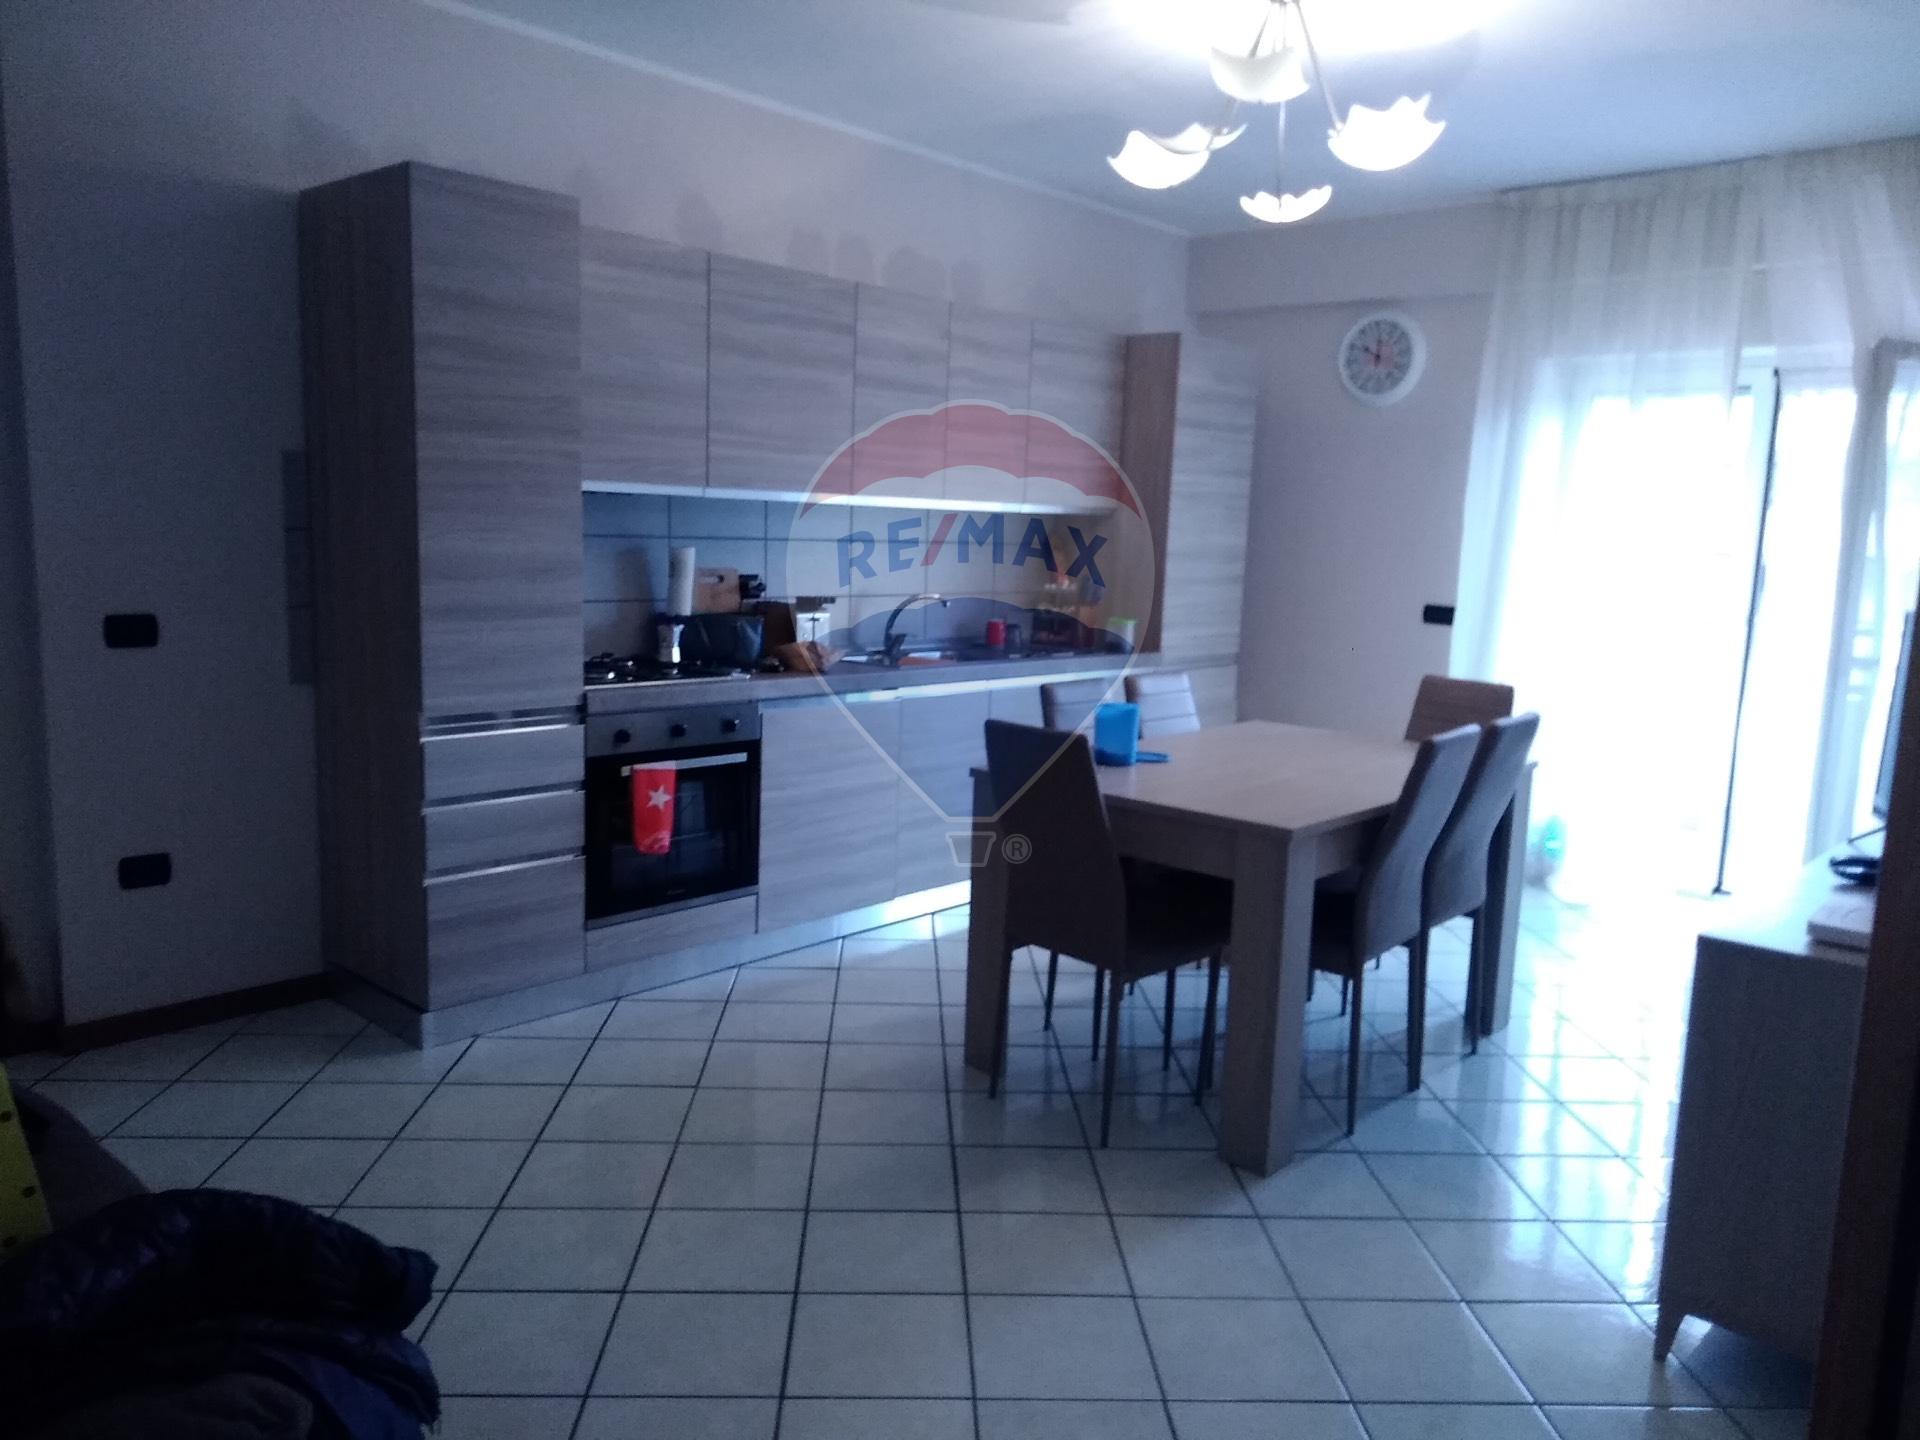 Appartamento in vendita Petrarelle-Via Josèmaria Escrivà Caserta